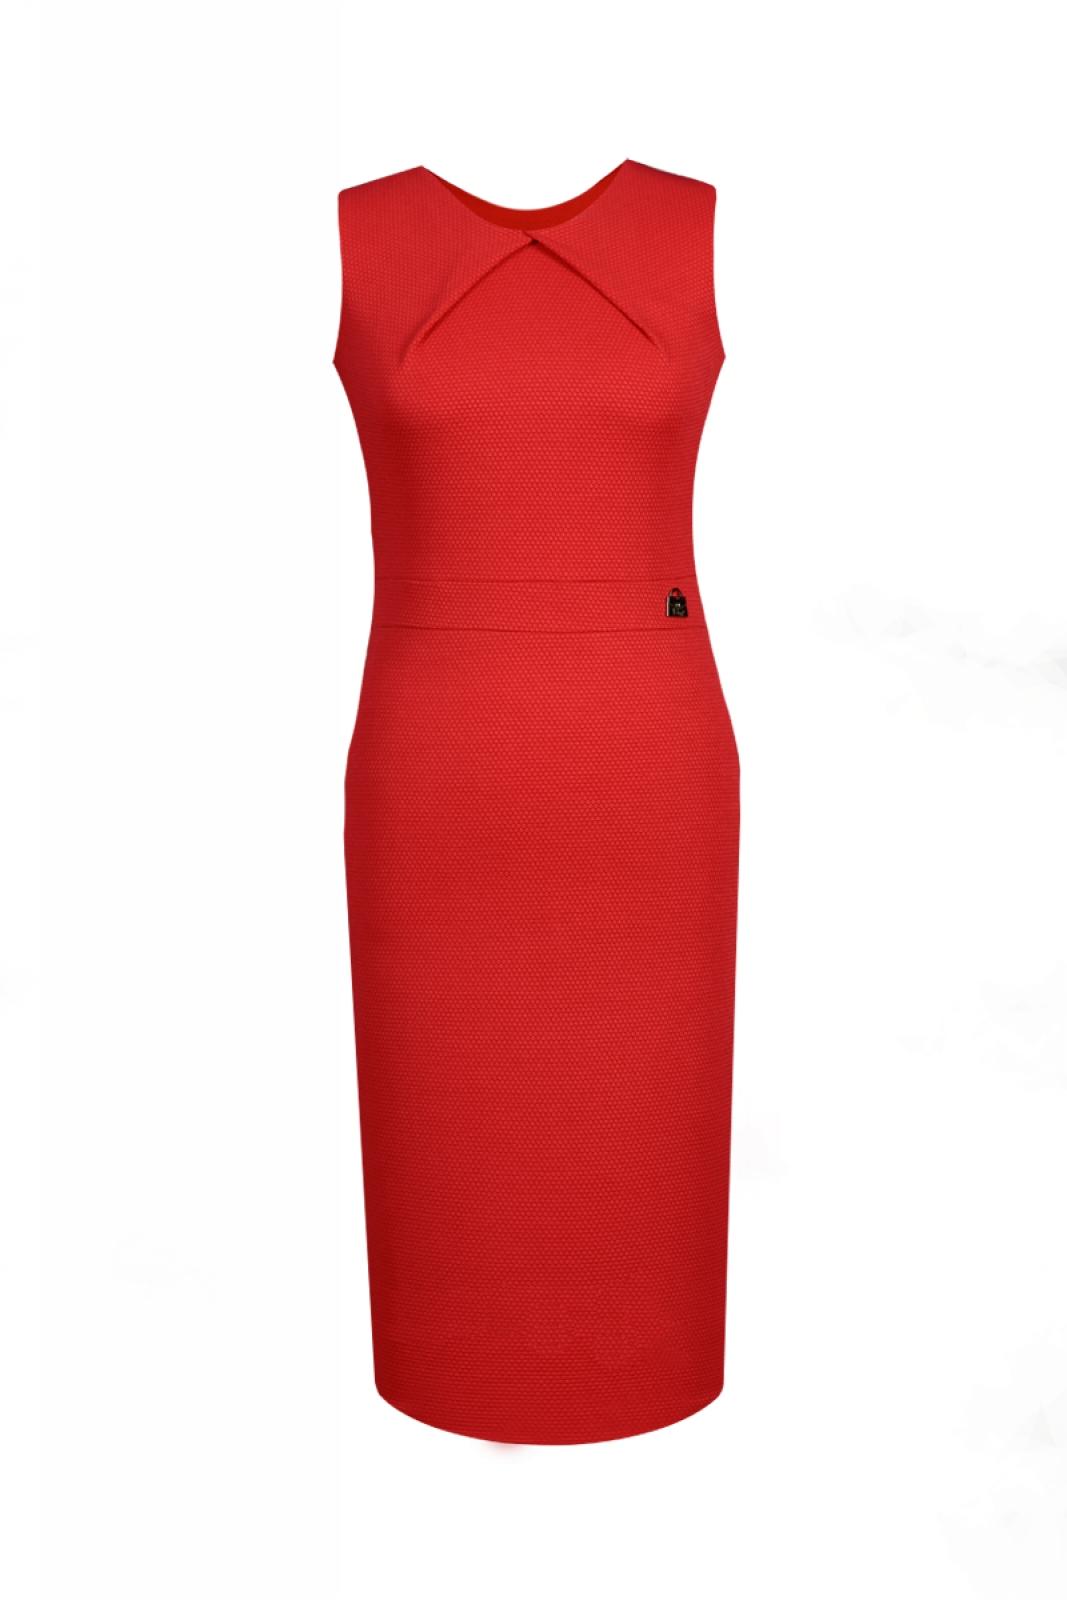 10 Fantastisch Kleid Rot Elegant für 201910 Genial Kleid Rot Elegant Bester Preis